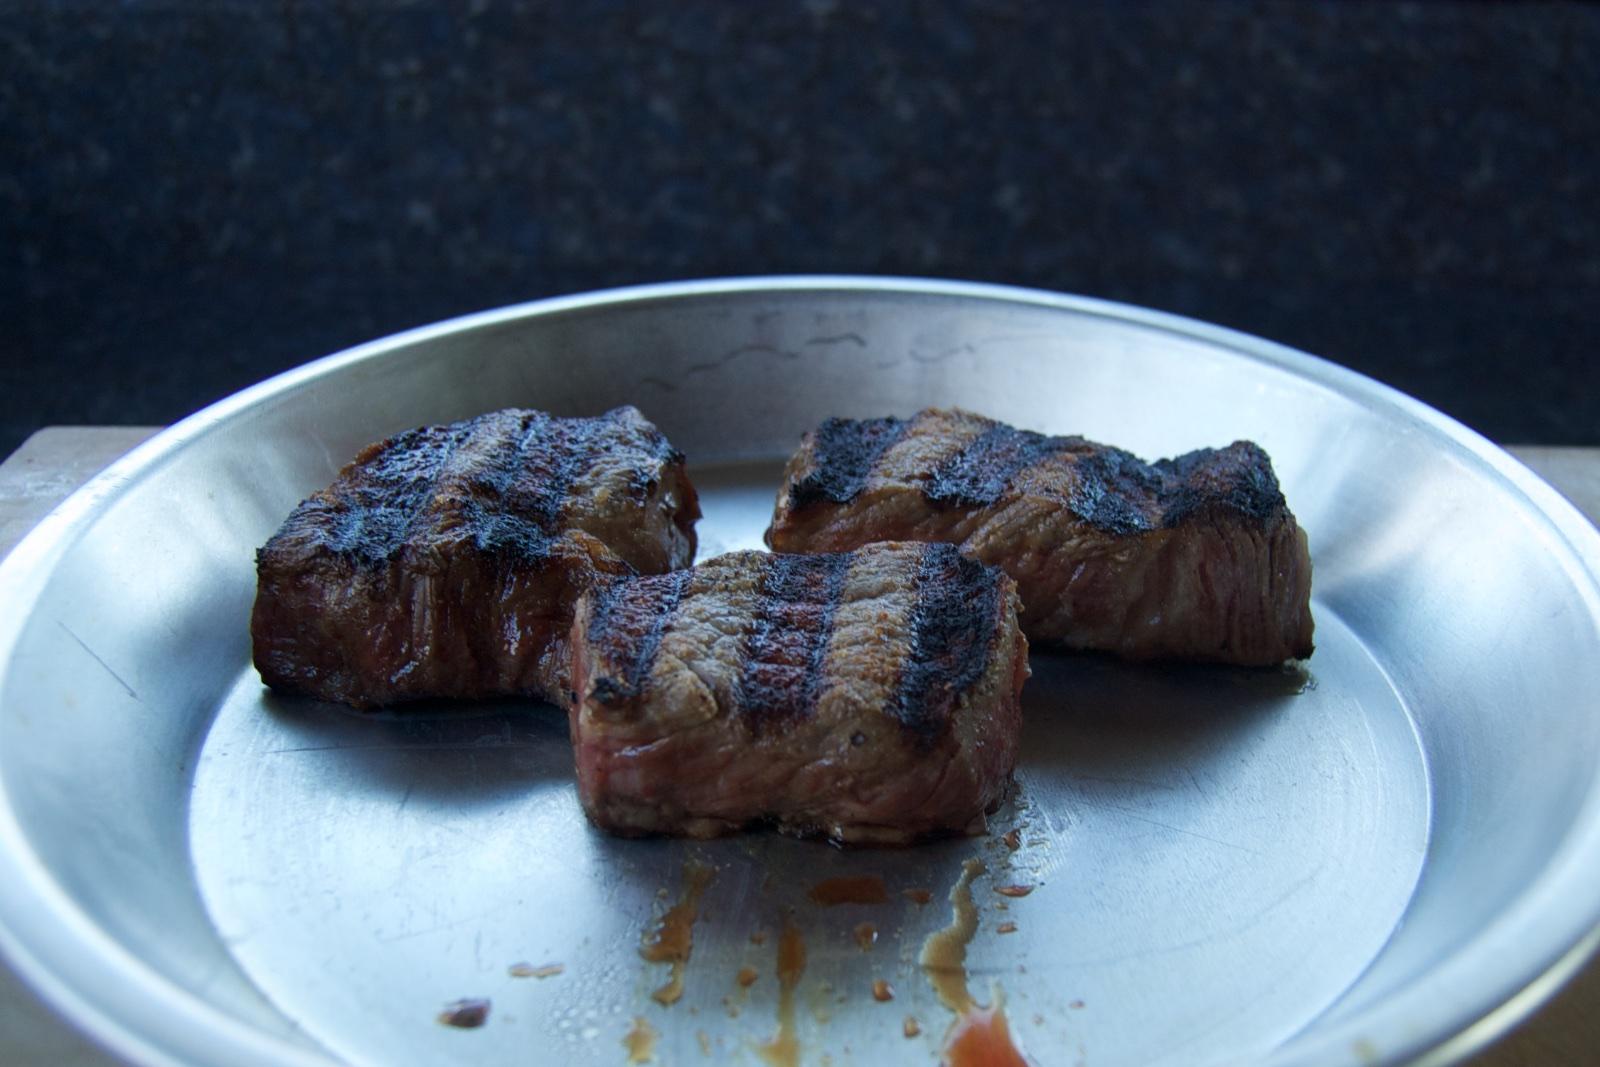 http://blog.rickk.com/food/2014/11/19/ate.2014.11.19.c1.jpg